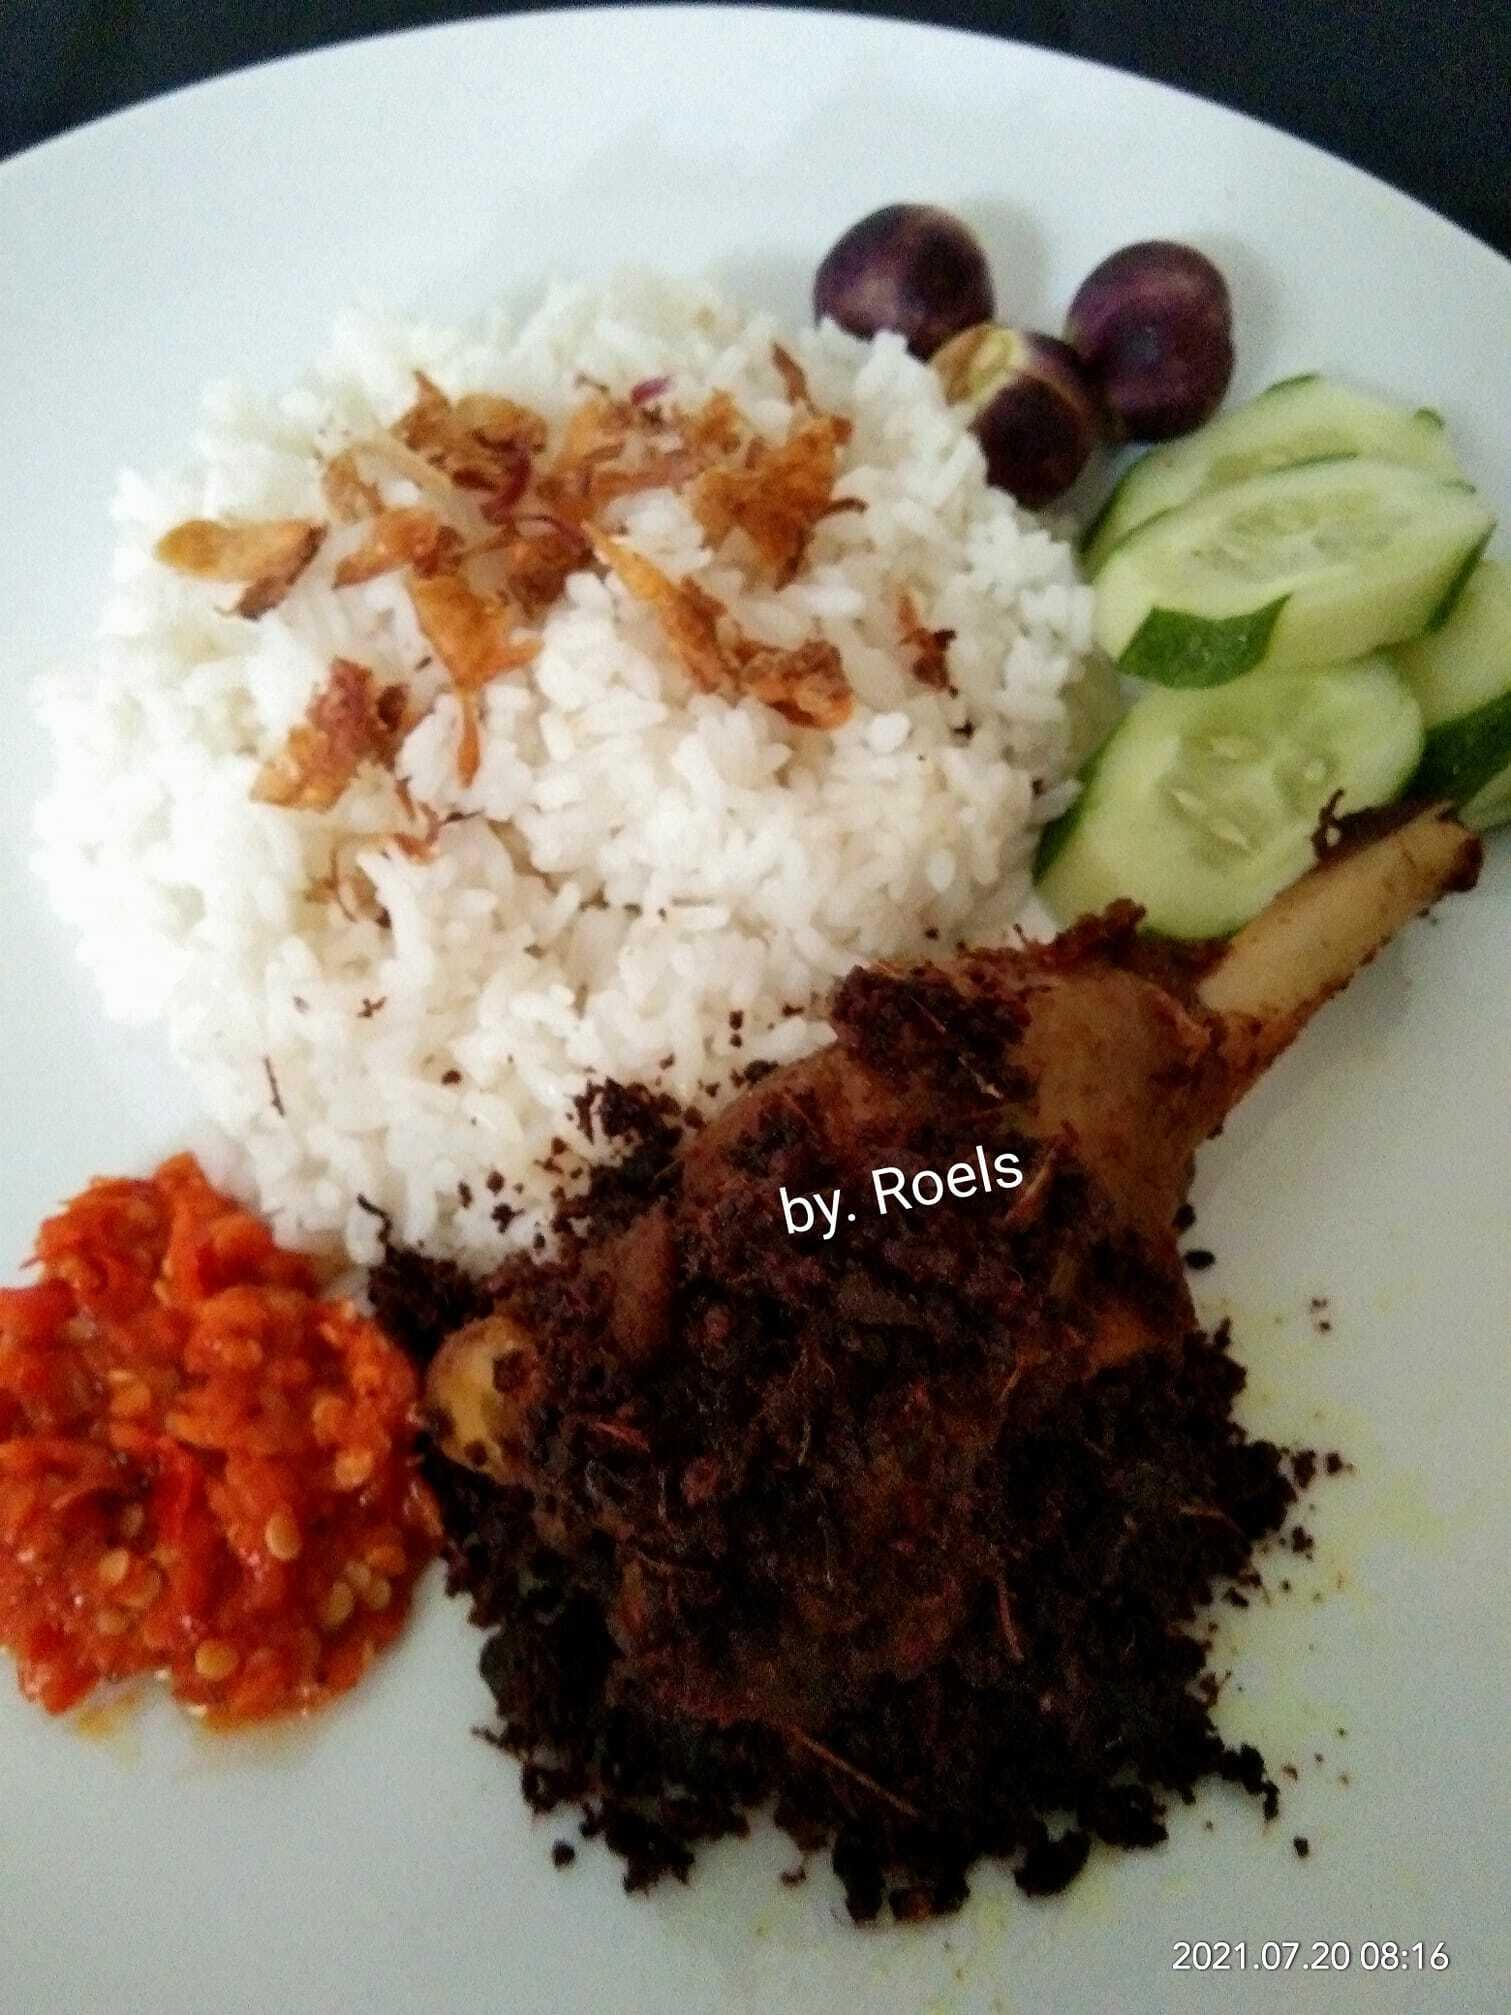 masakan khas Madura Bebek Goreng Bumbu Hitam by Nurul Roels